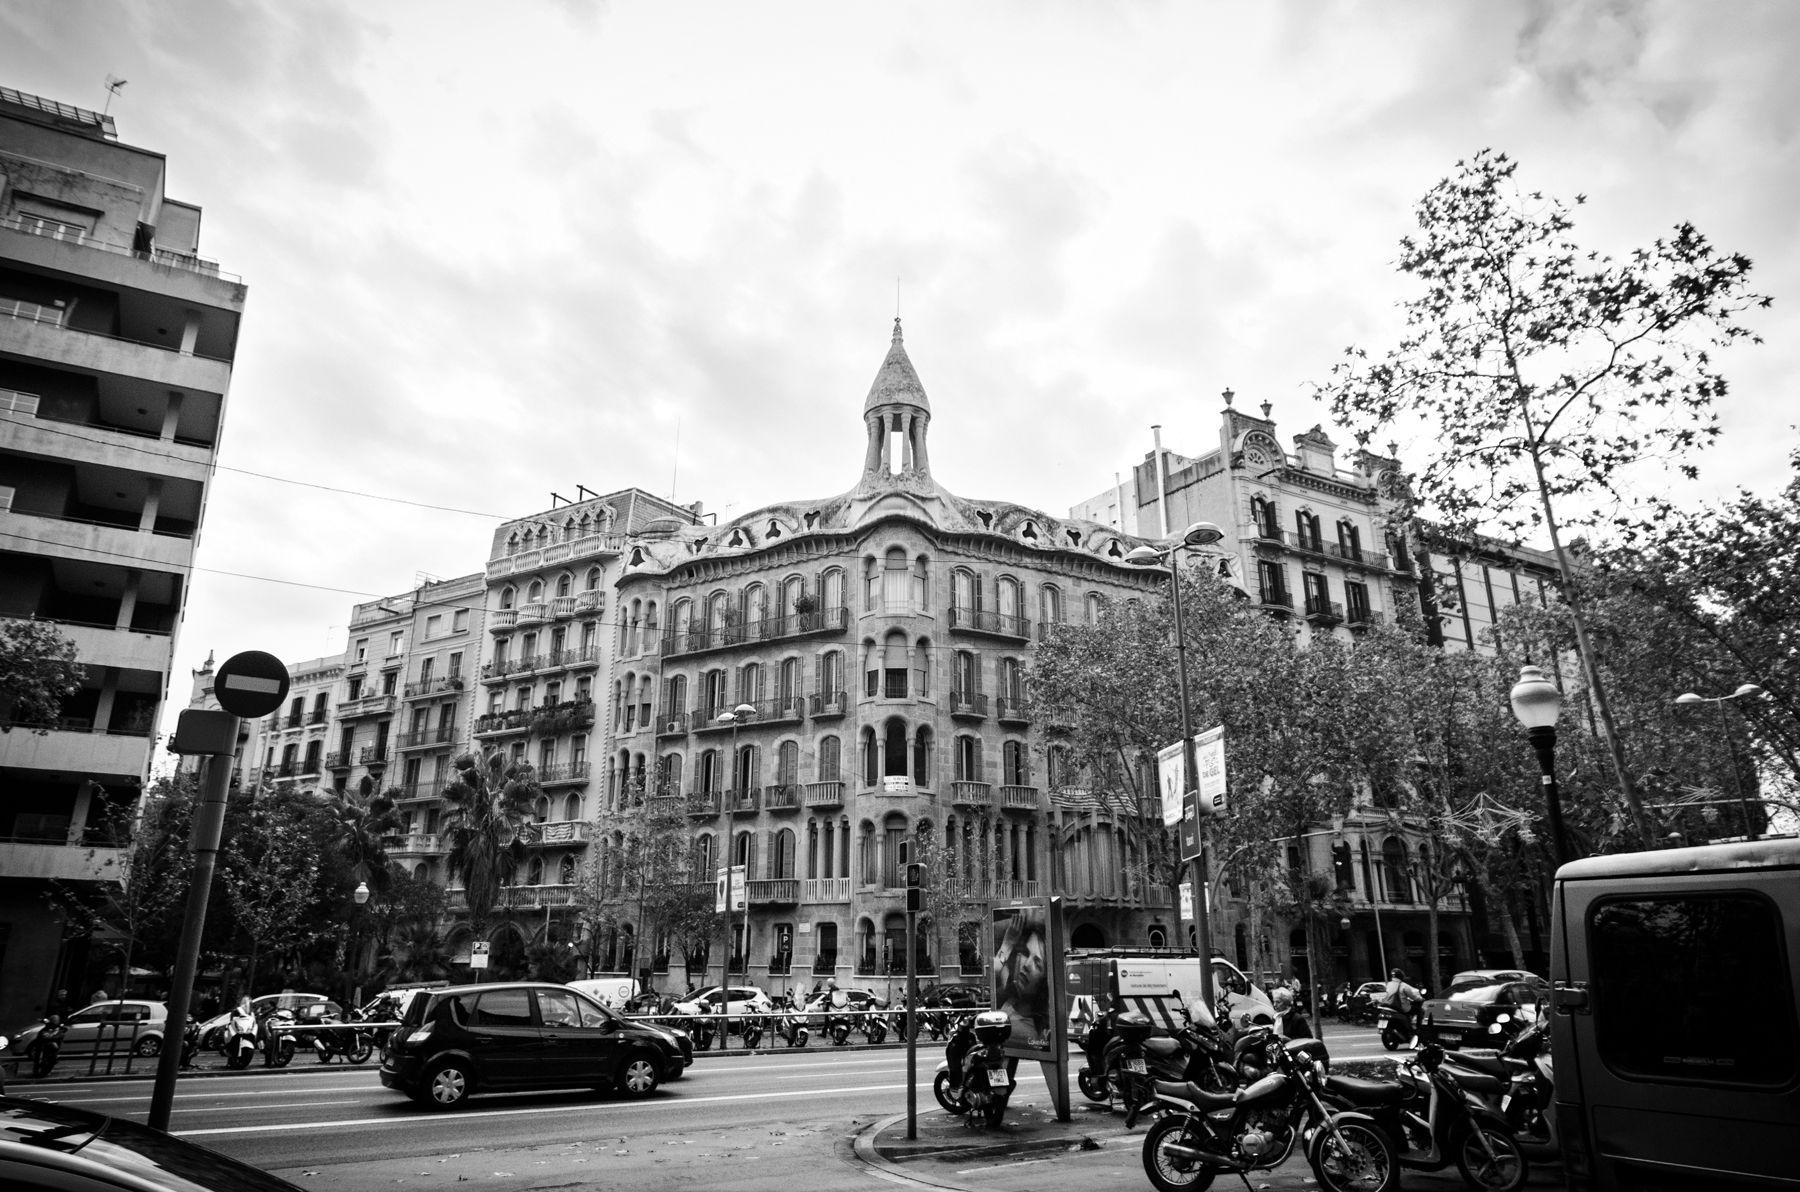 Stunning architecture @ Barcelona